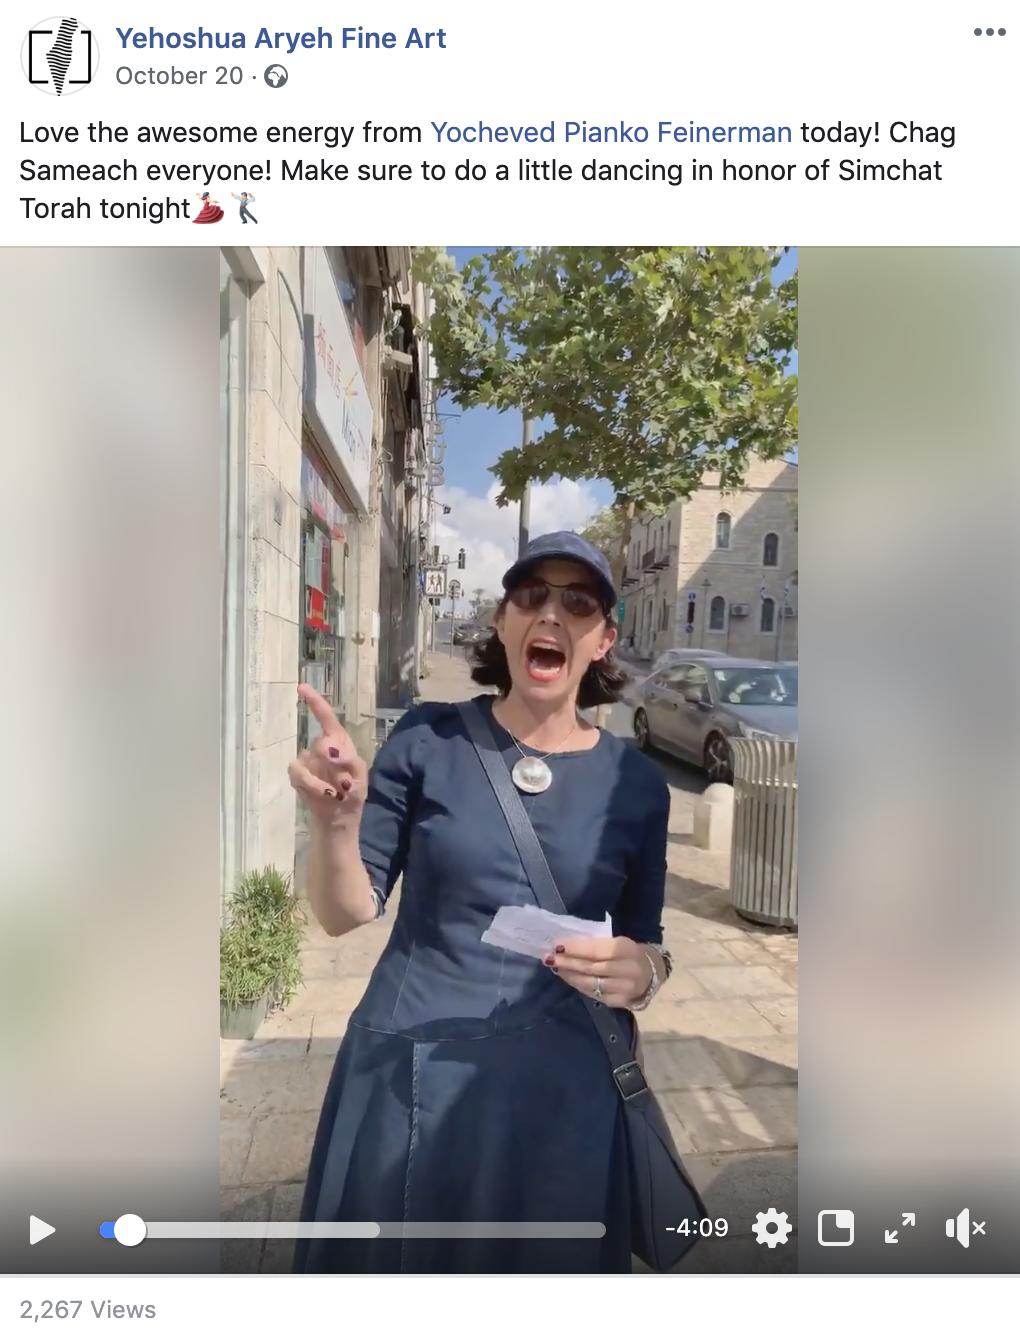 [WATCH] Yehoshua Aryeh Fine Art Facebook Live Video